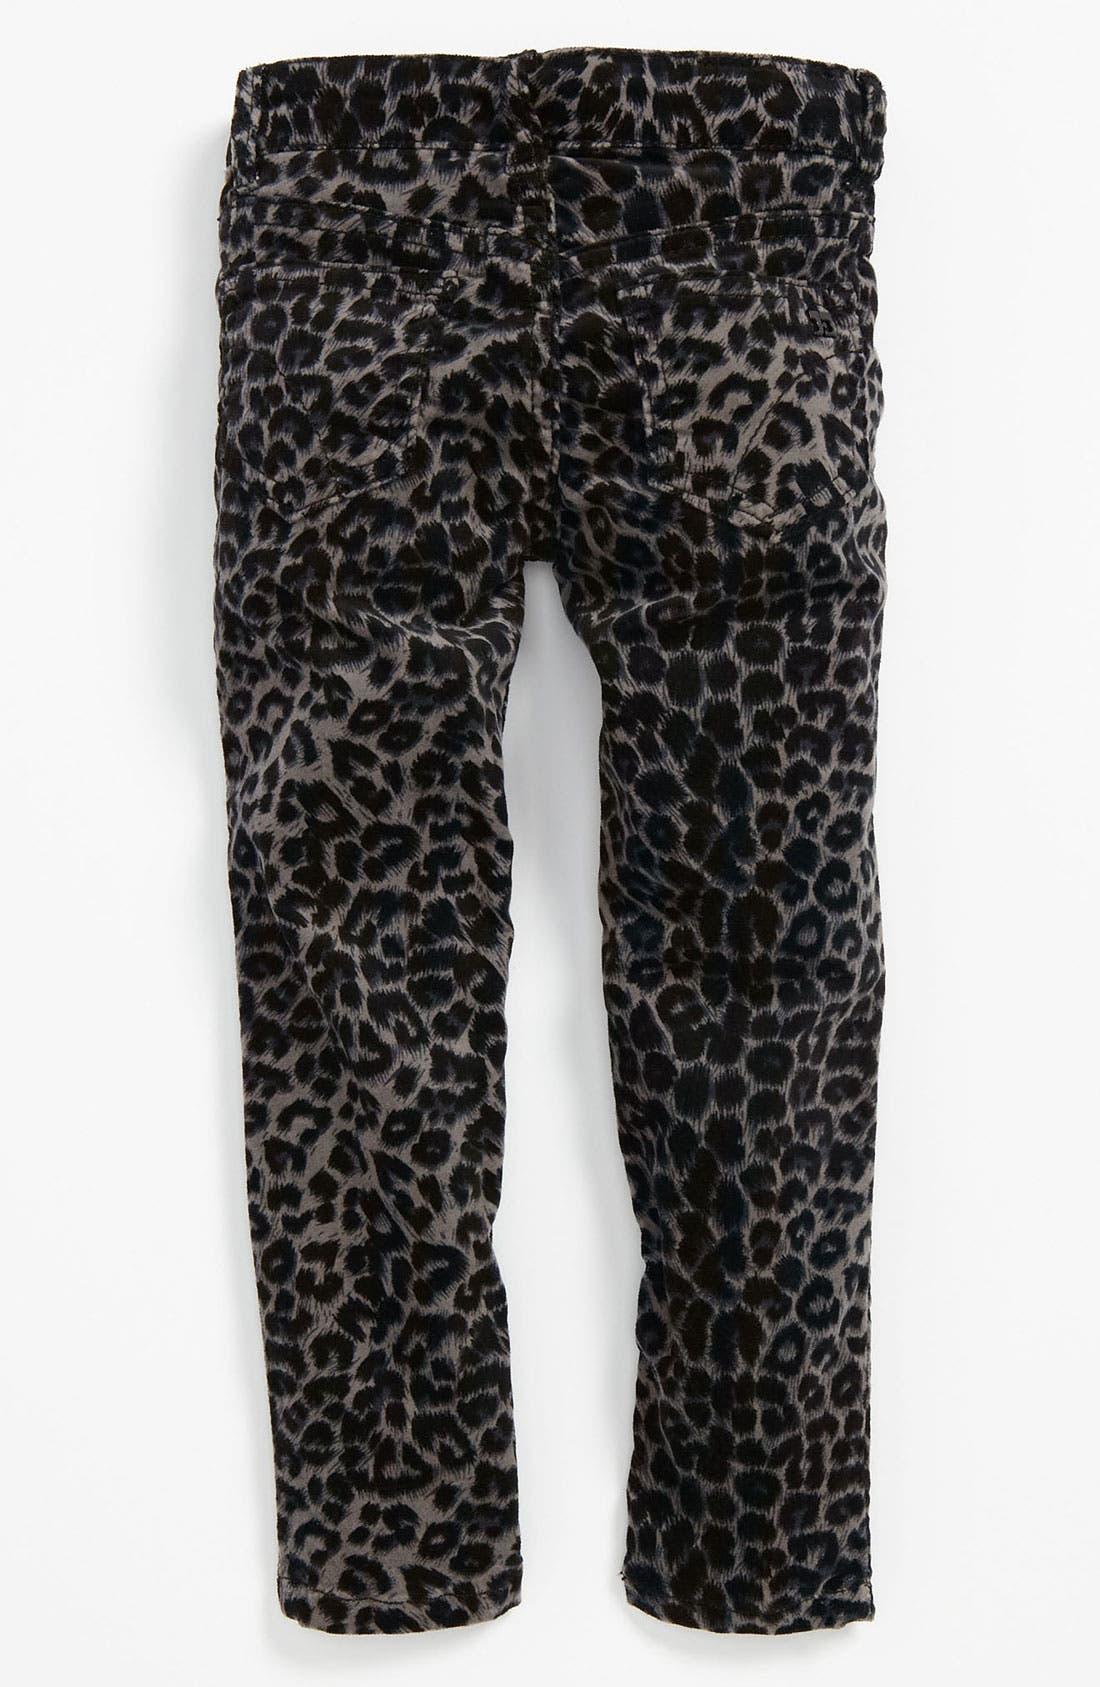 Main Image - Joe's Stretch Skinny Animal Print Velvet Denim Pants (Toddler)